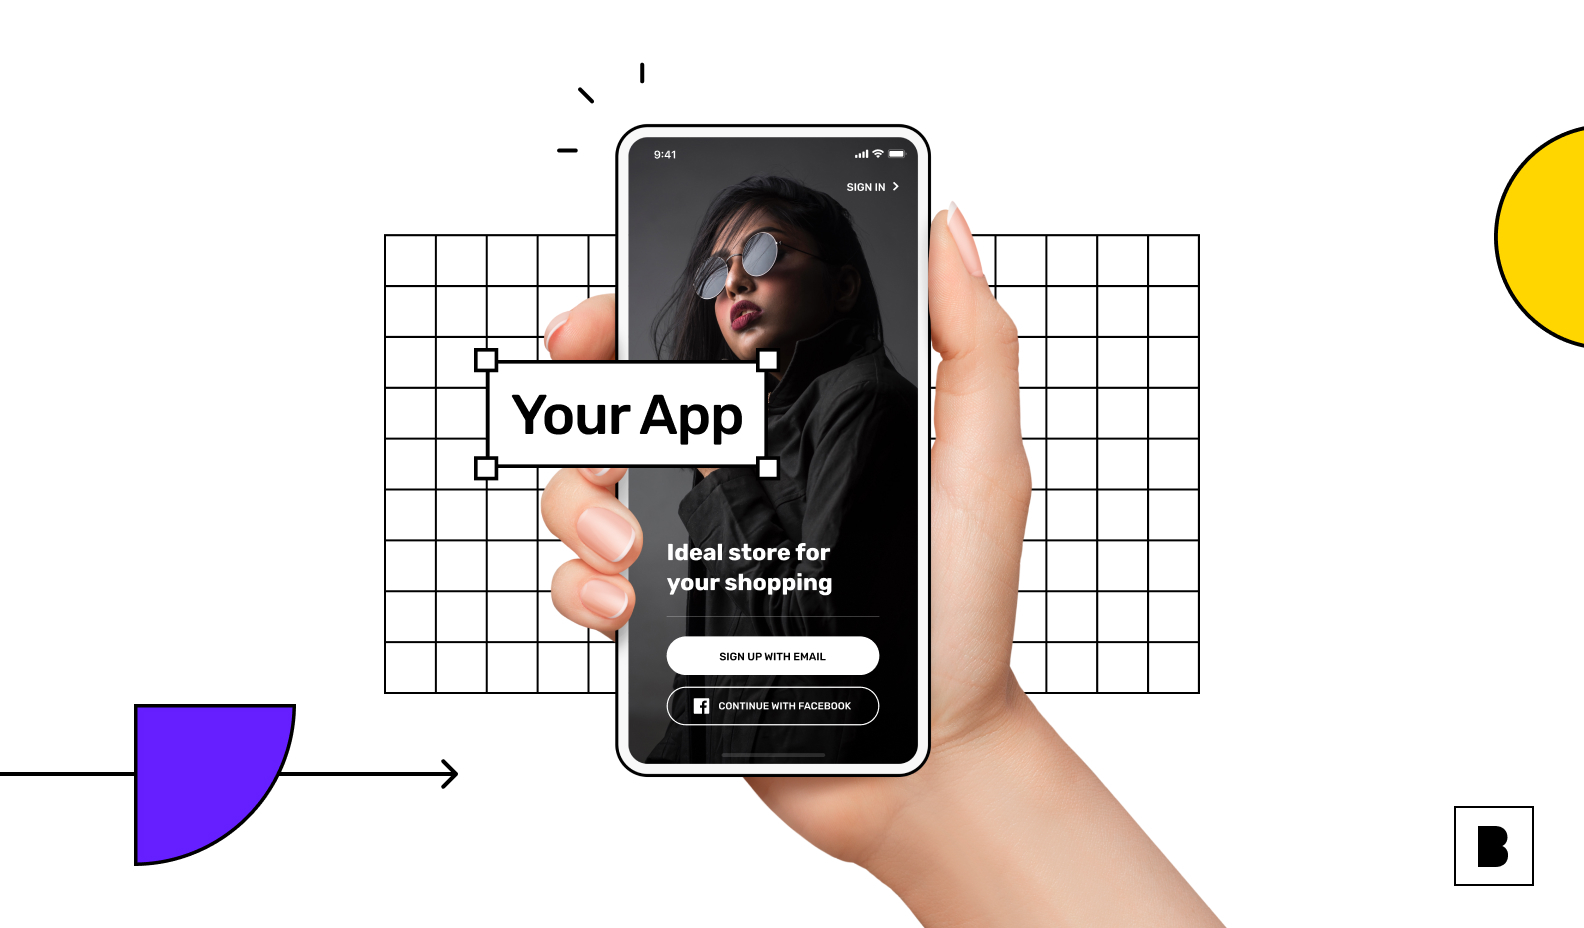 Mobile app illustration with login screen